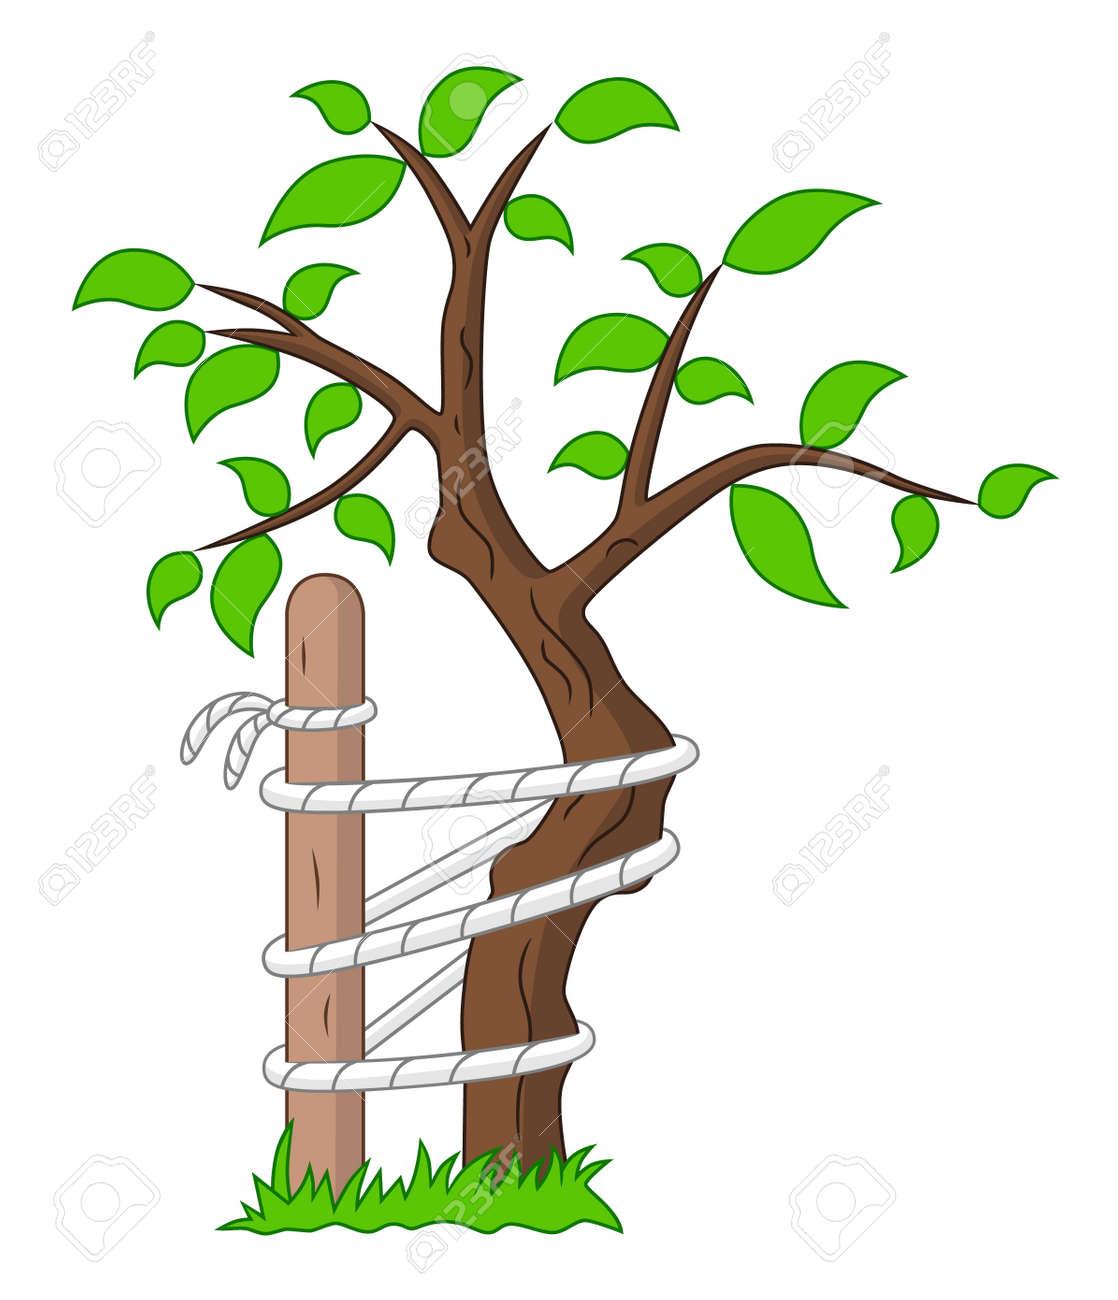 Orthopedic symbol tree of Andry - 76597865